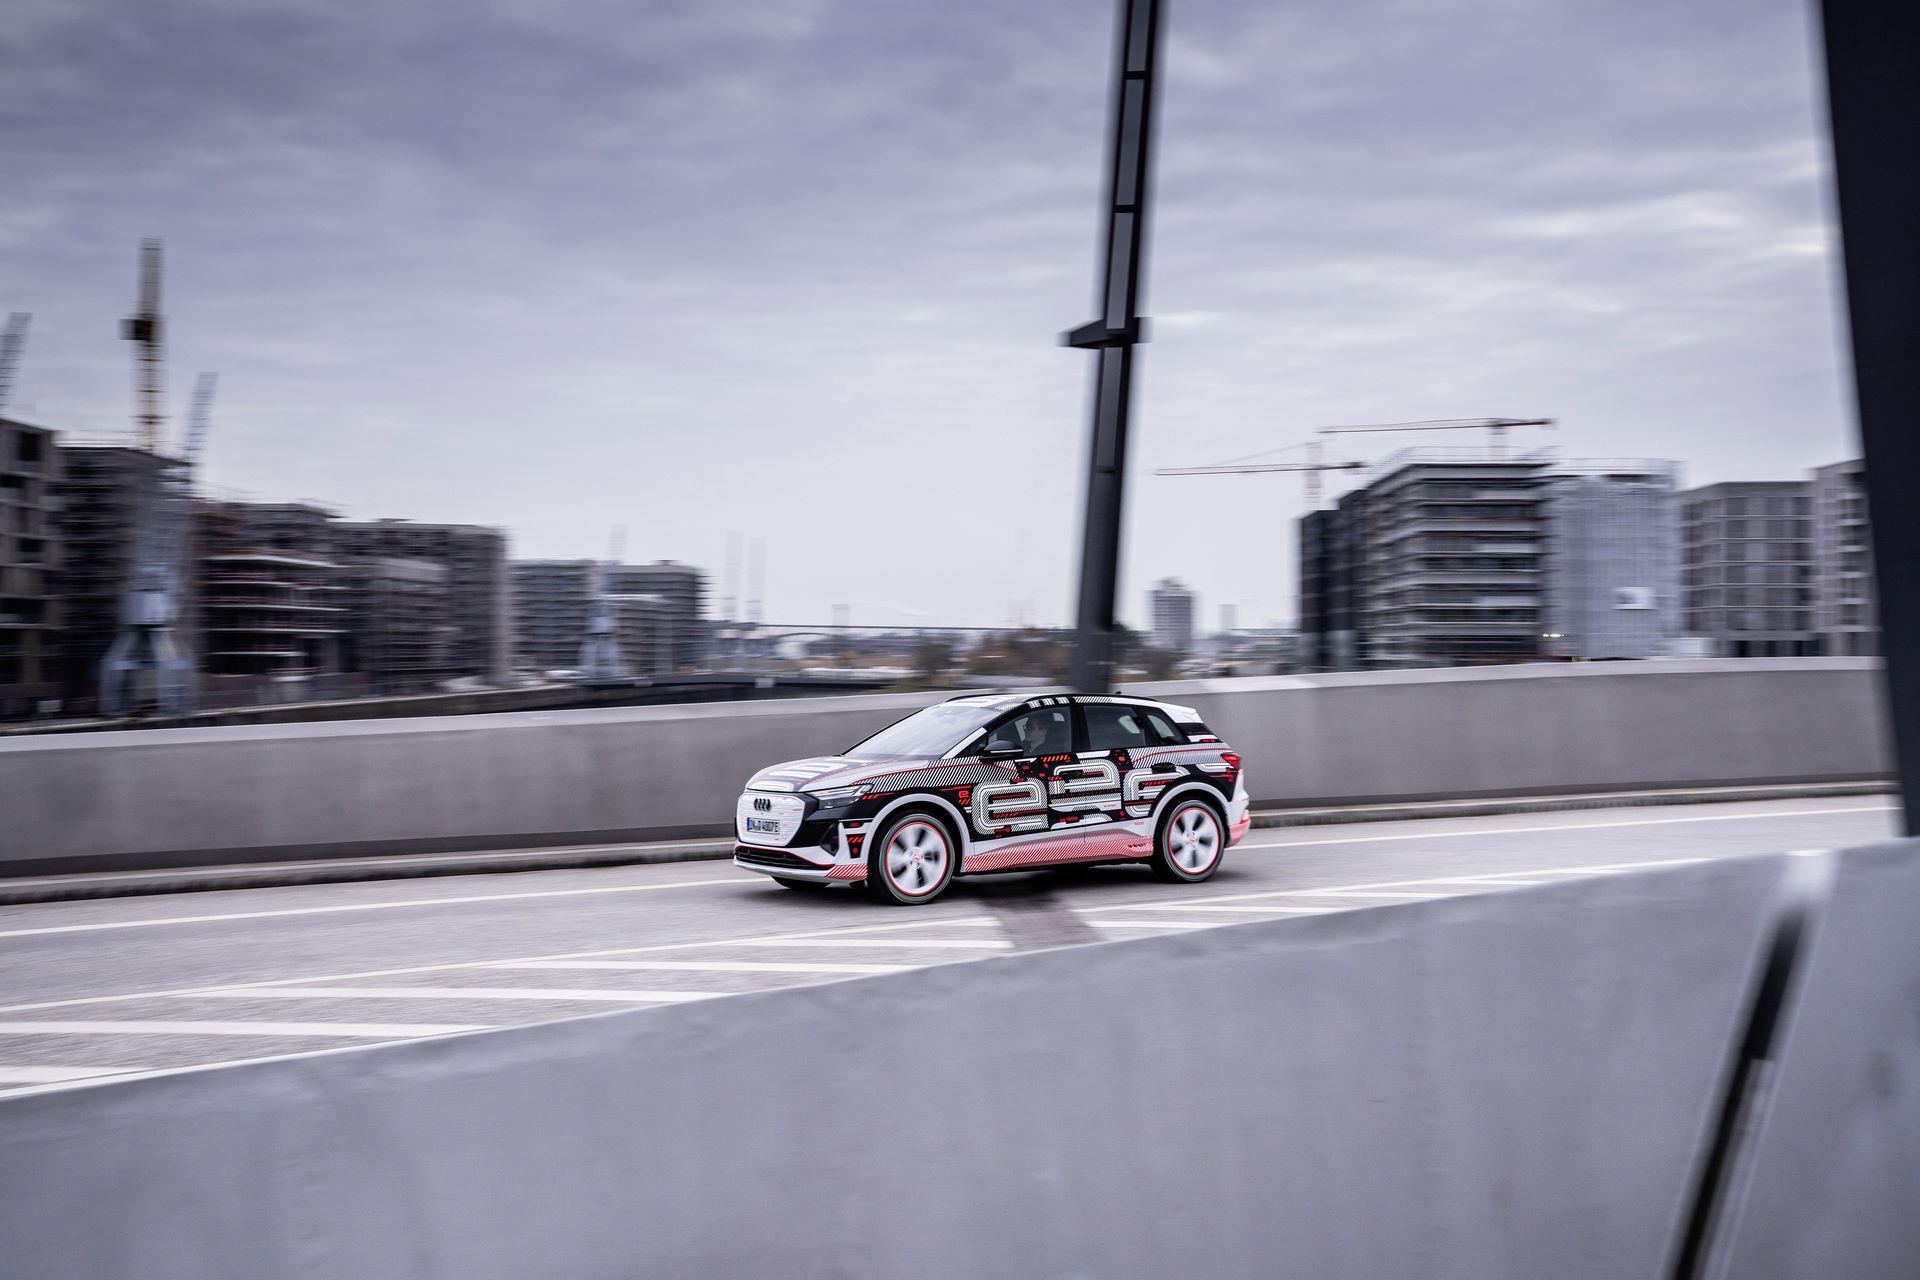 Audi-Q4-E-Tron-26